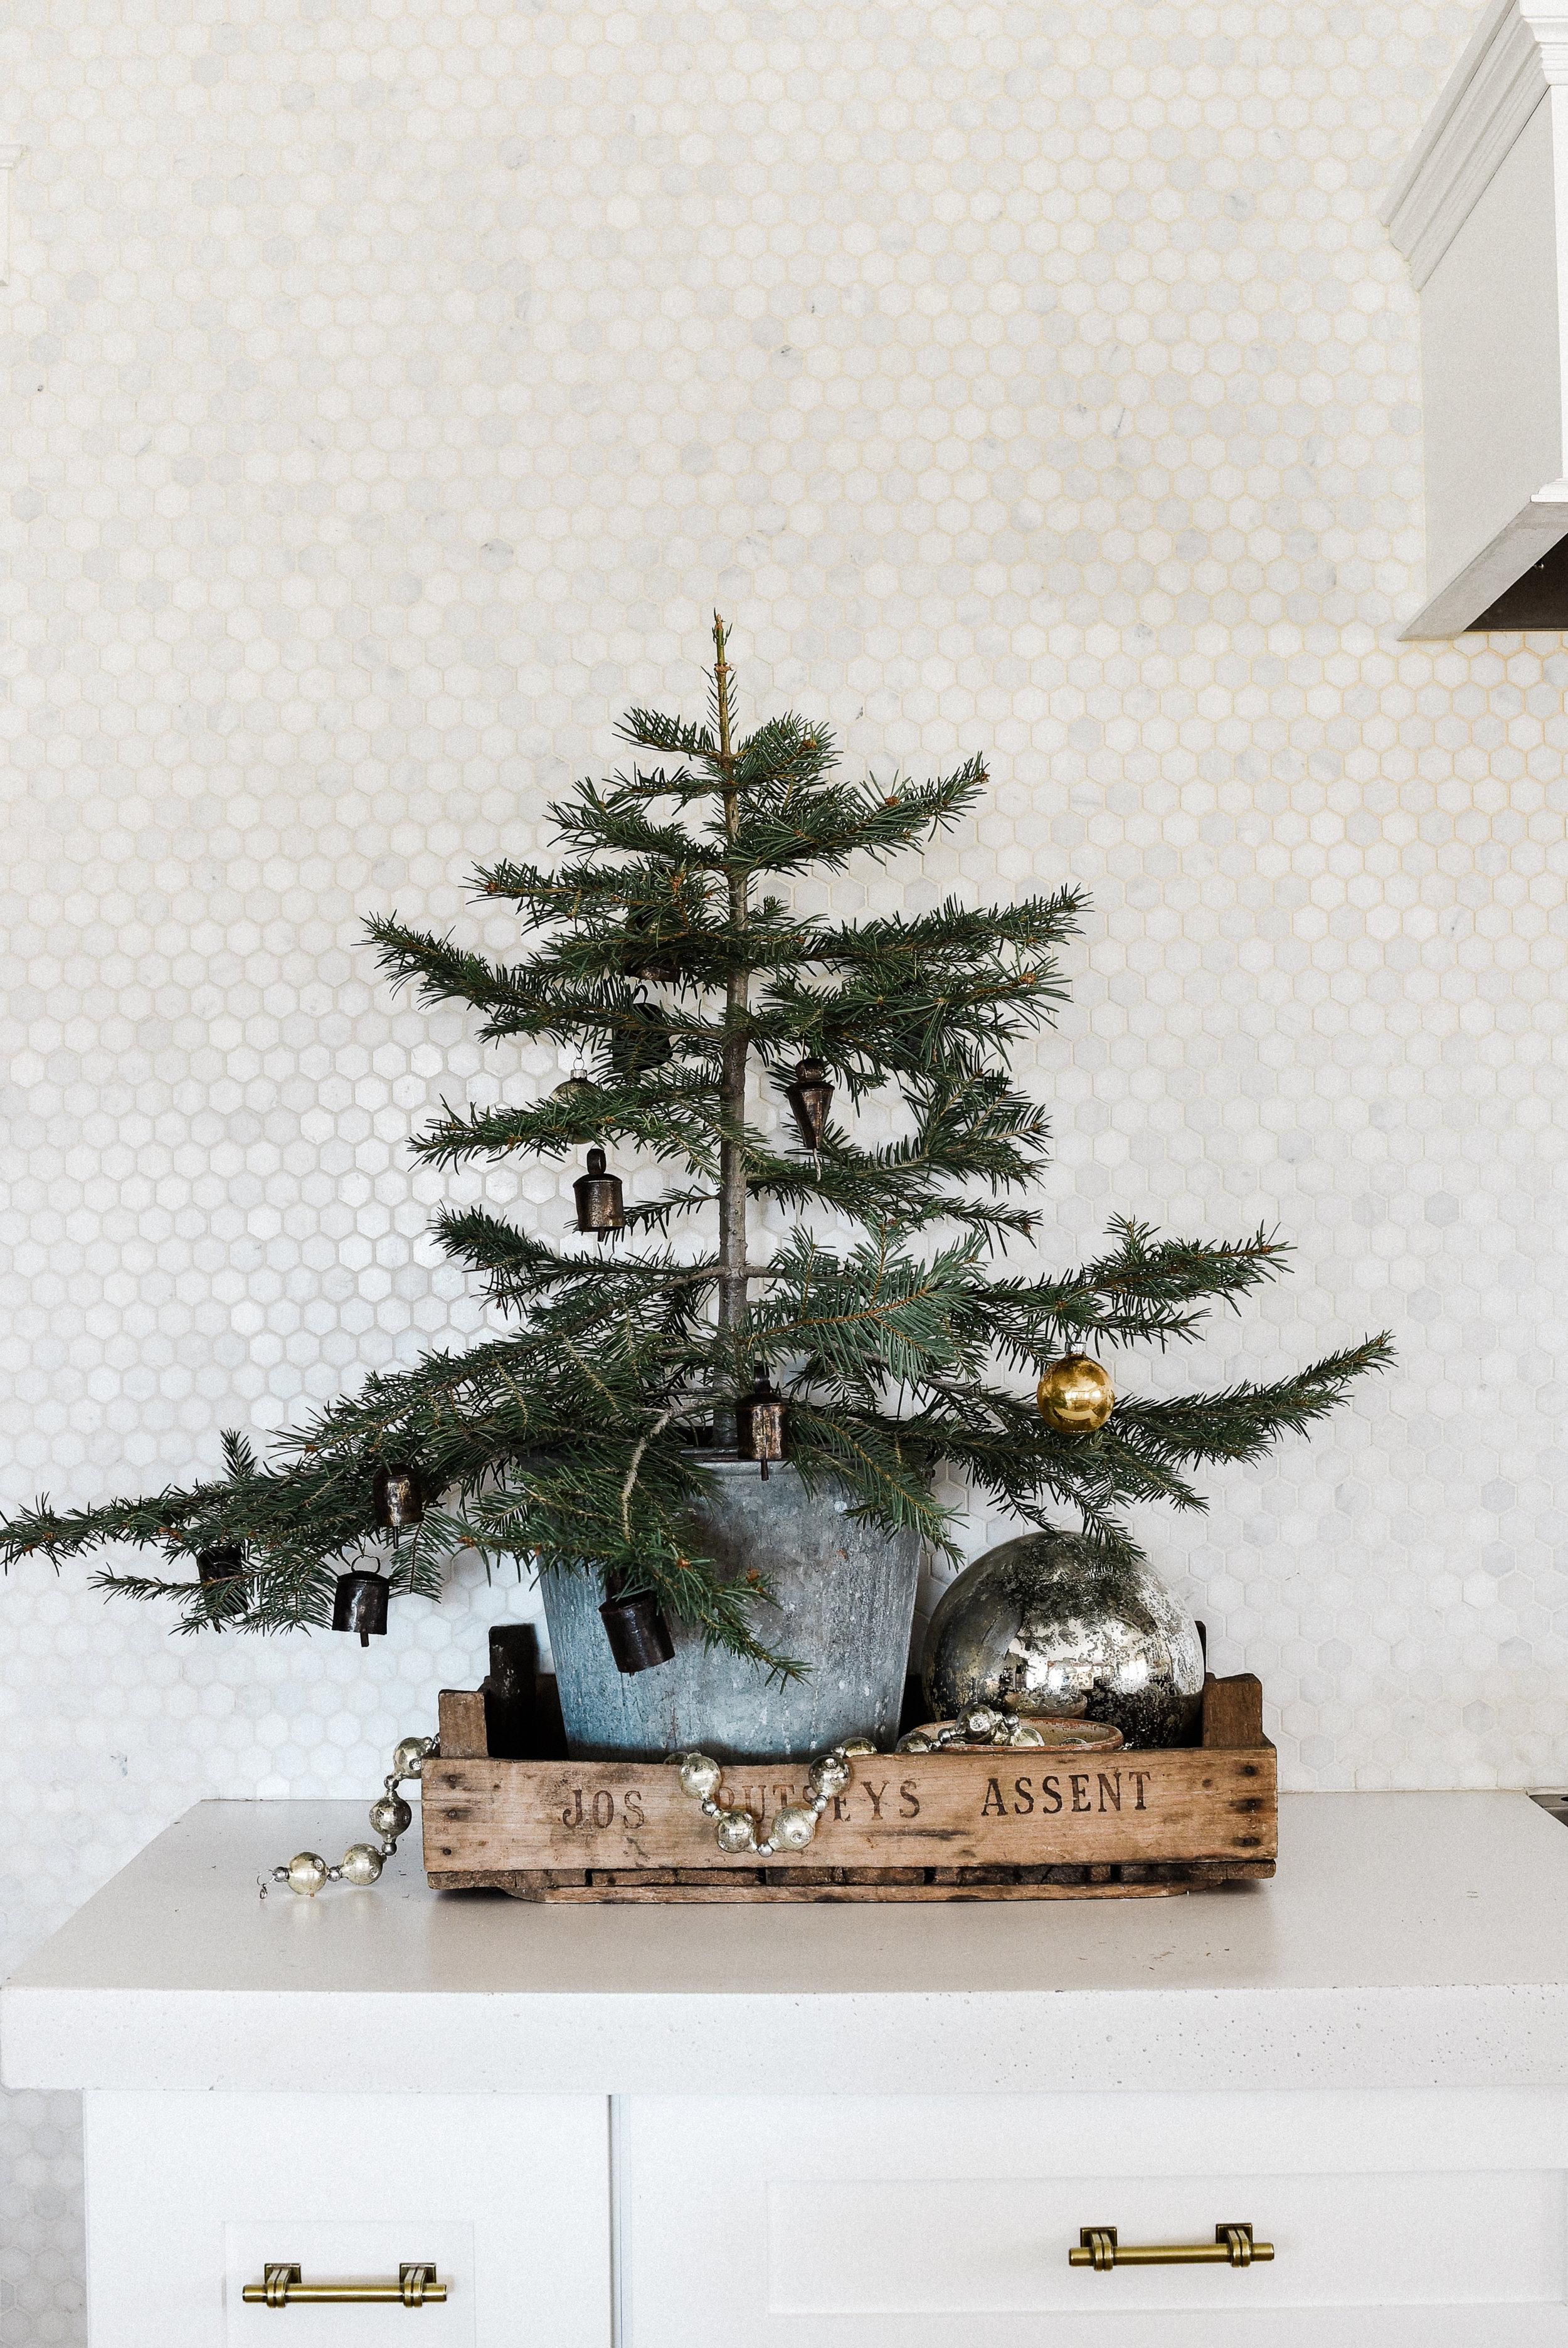 Minimalistic Christmas tree decorating ideas from boxwoodavenue.com | #farmhousechristmas